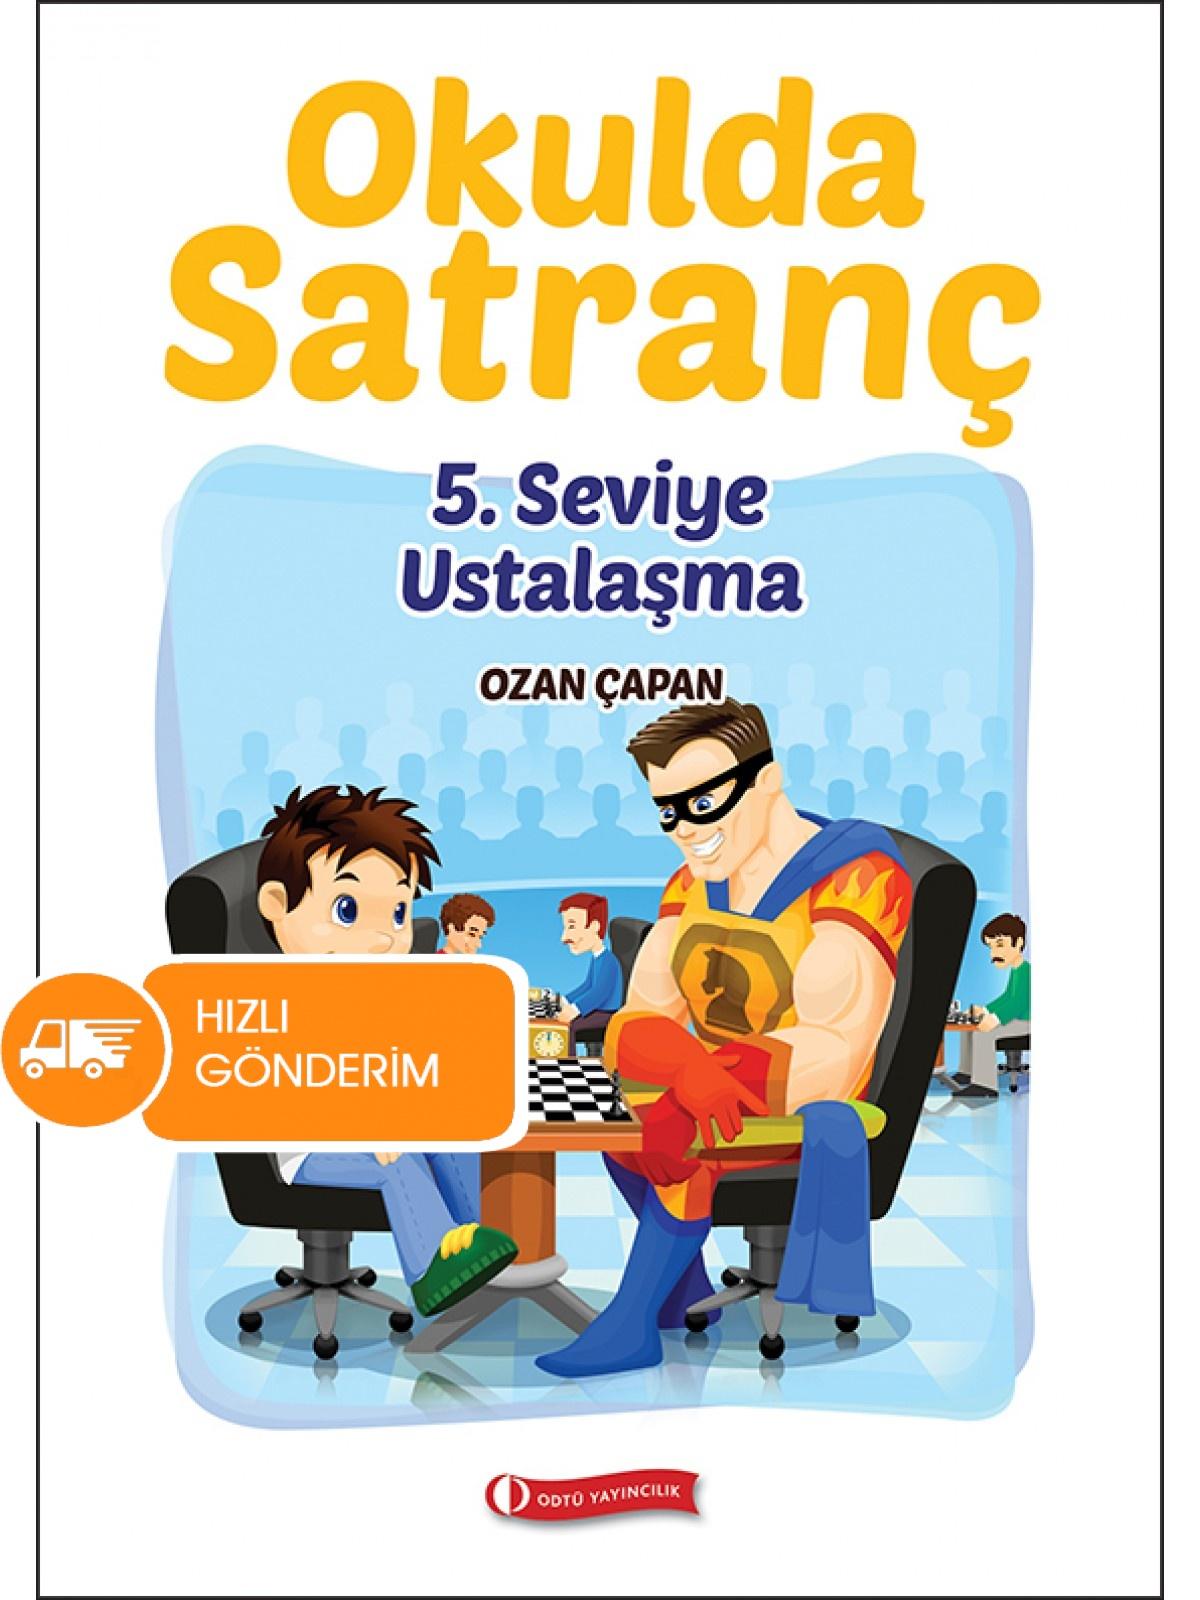 Okulda Satranç - 5. Seviye Ustalaşma